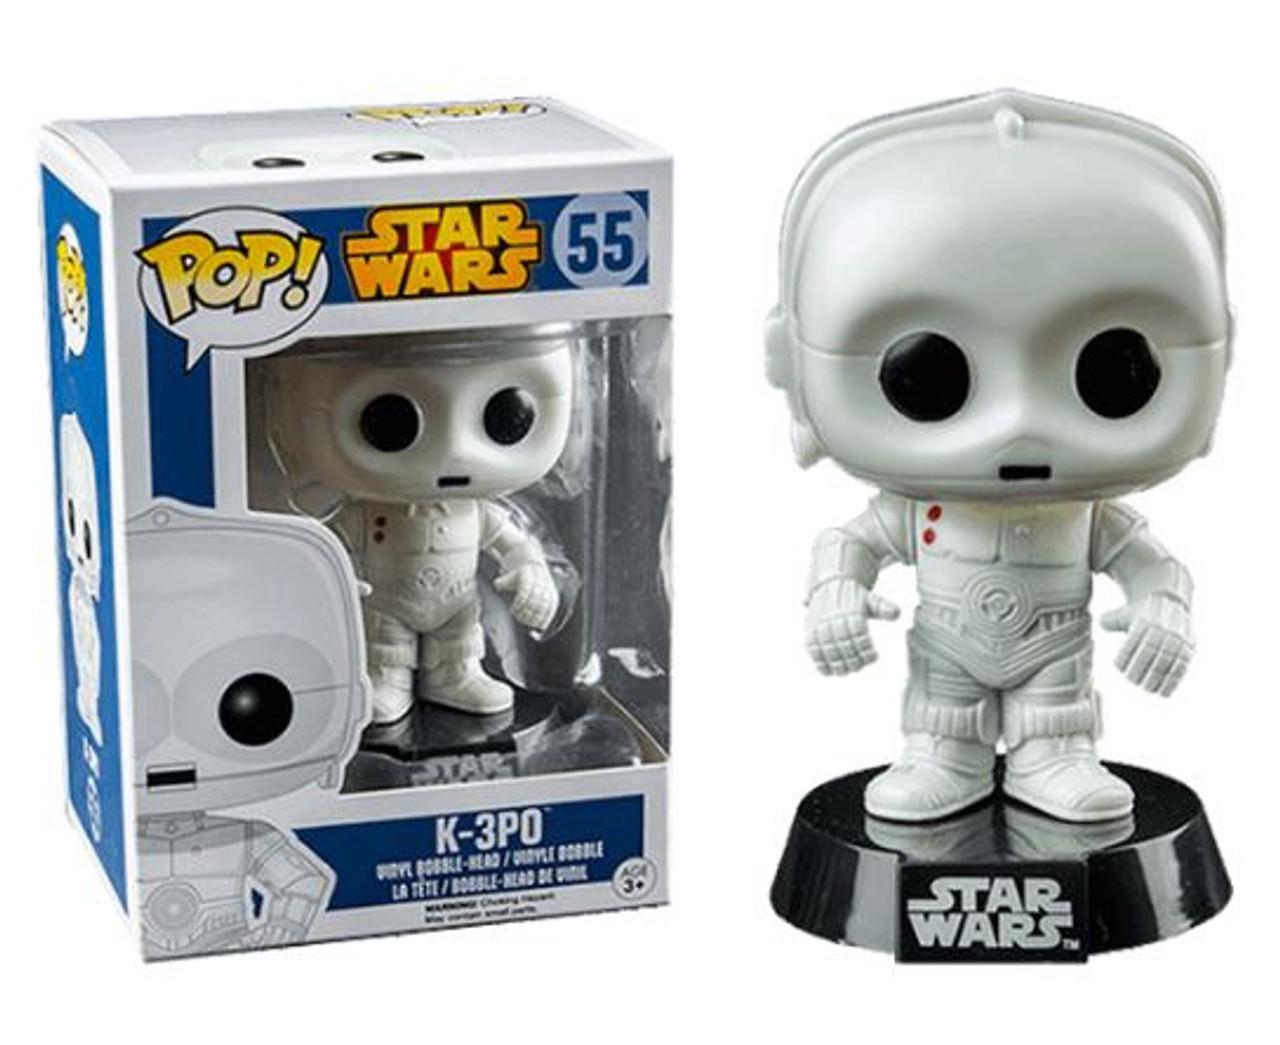 Star Wars - K-3PO Pop! Vinyl Figure